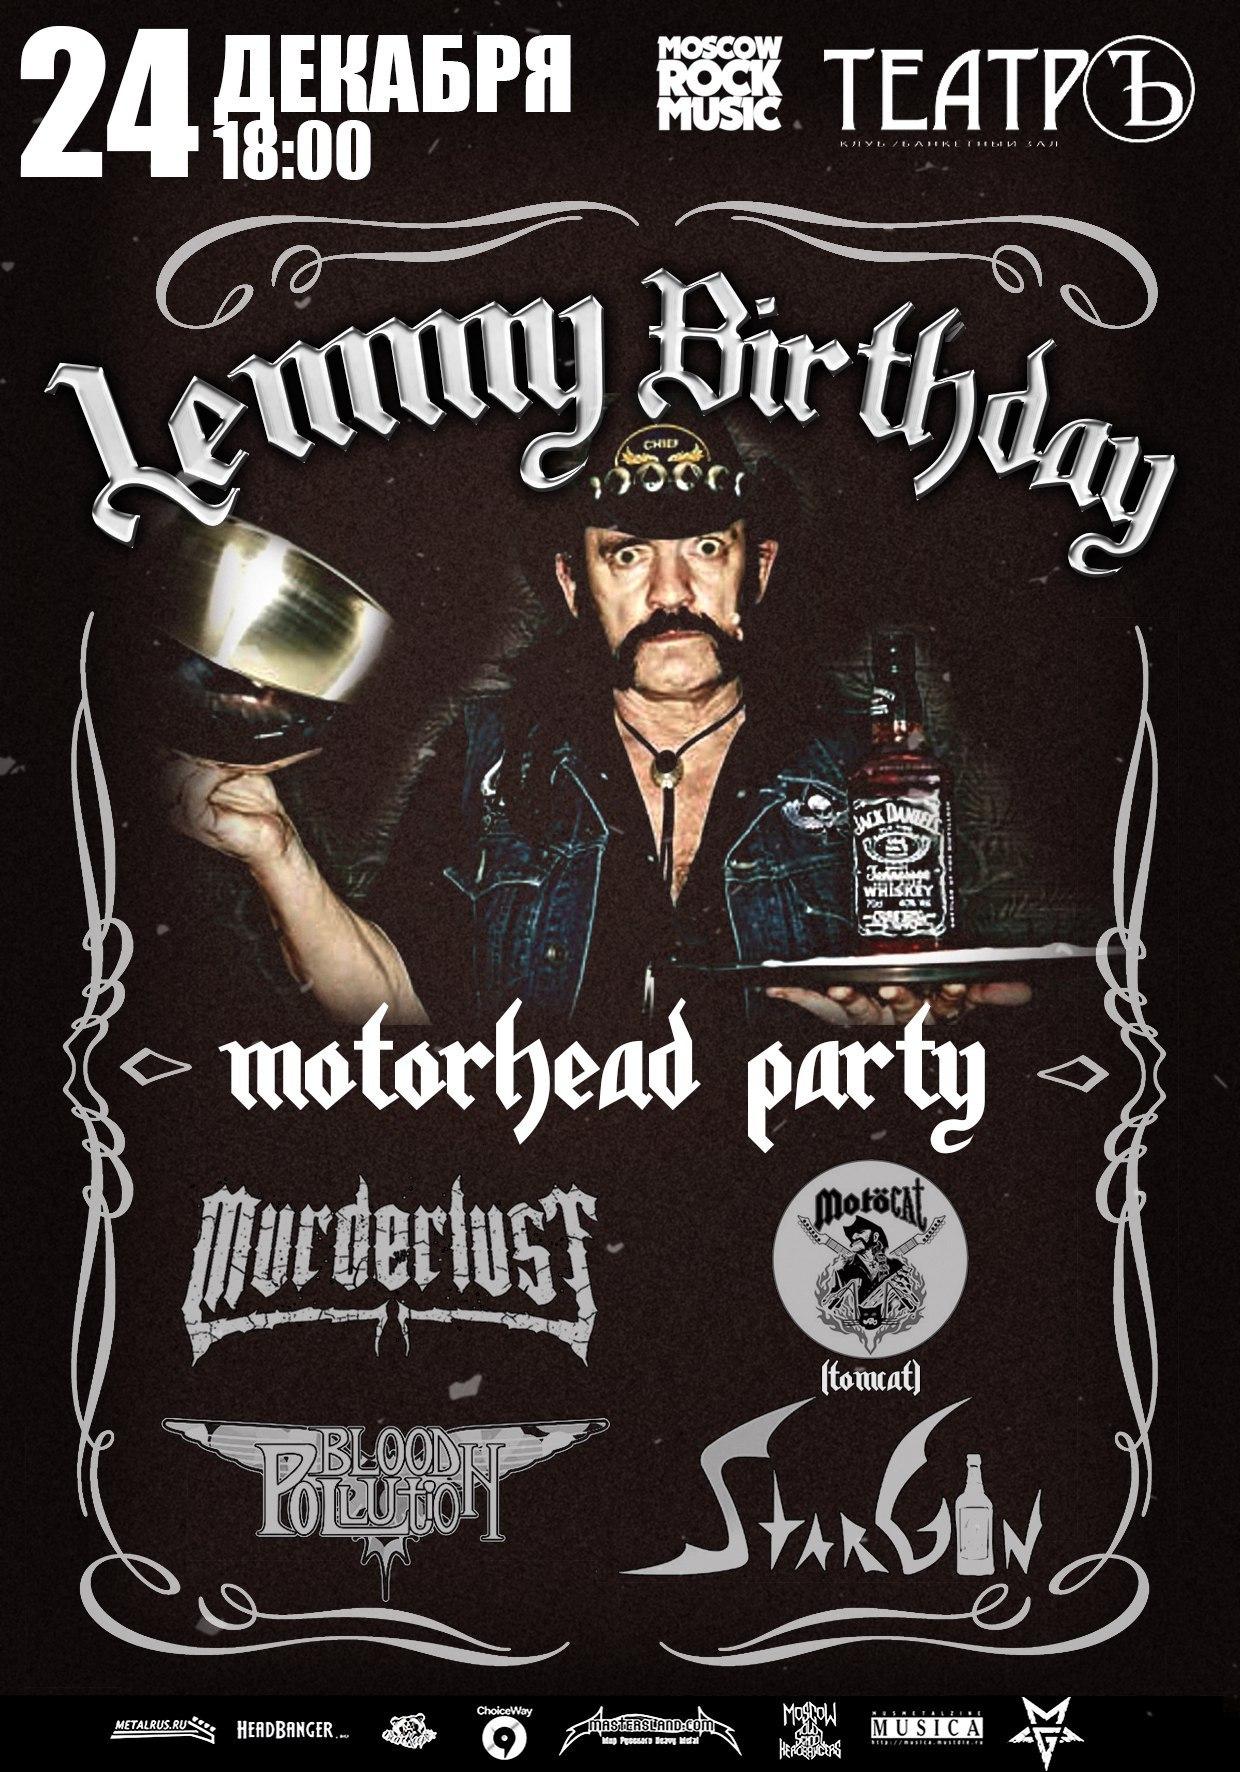 24.12 - Tribute To Motorhead | LEMMY BIRTHDAY - клуб Театръ (Мск)